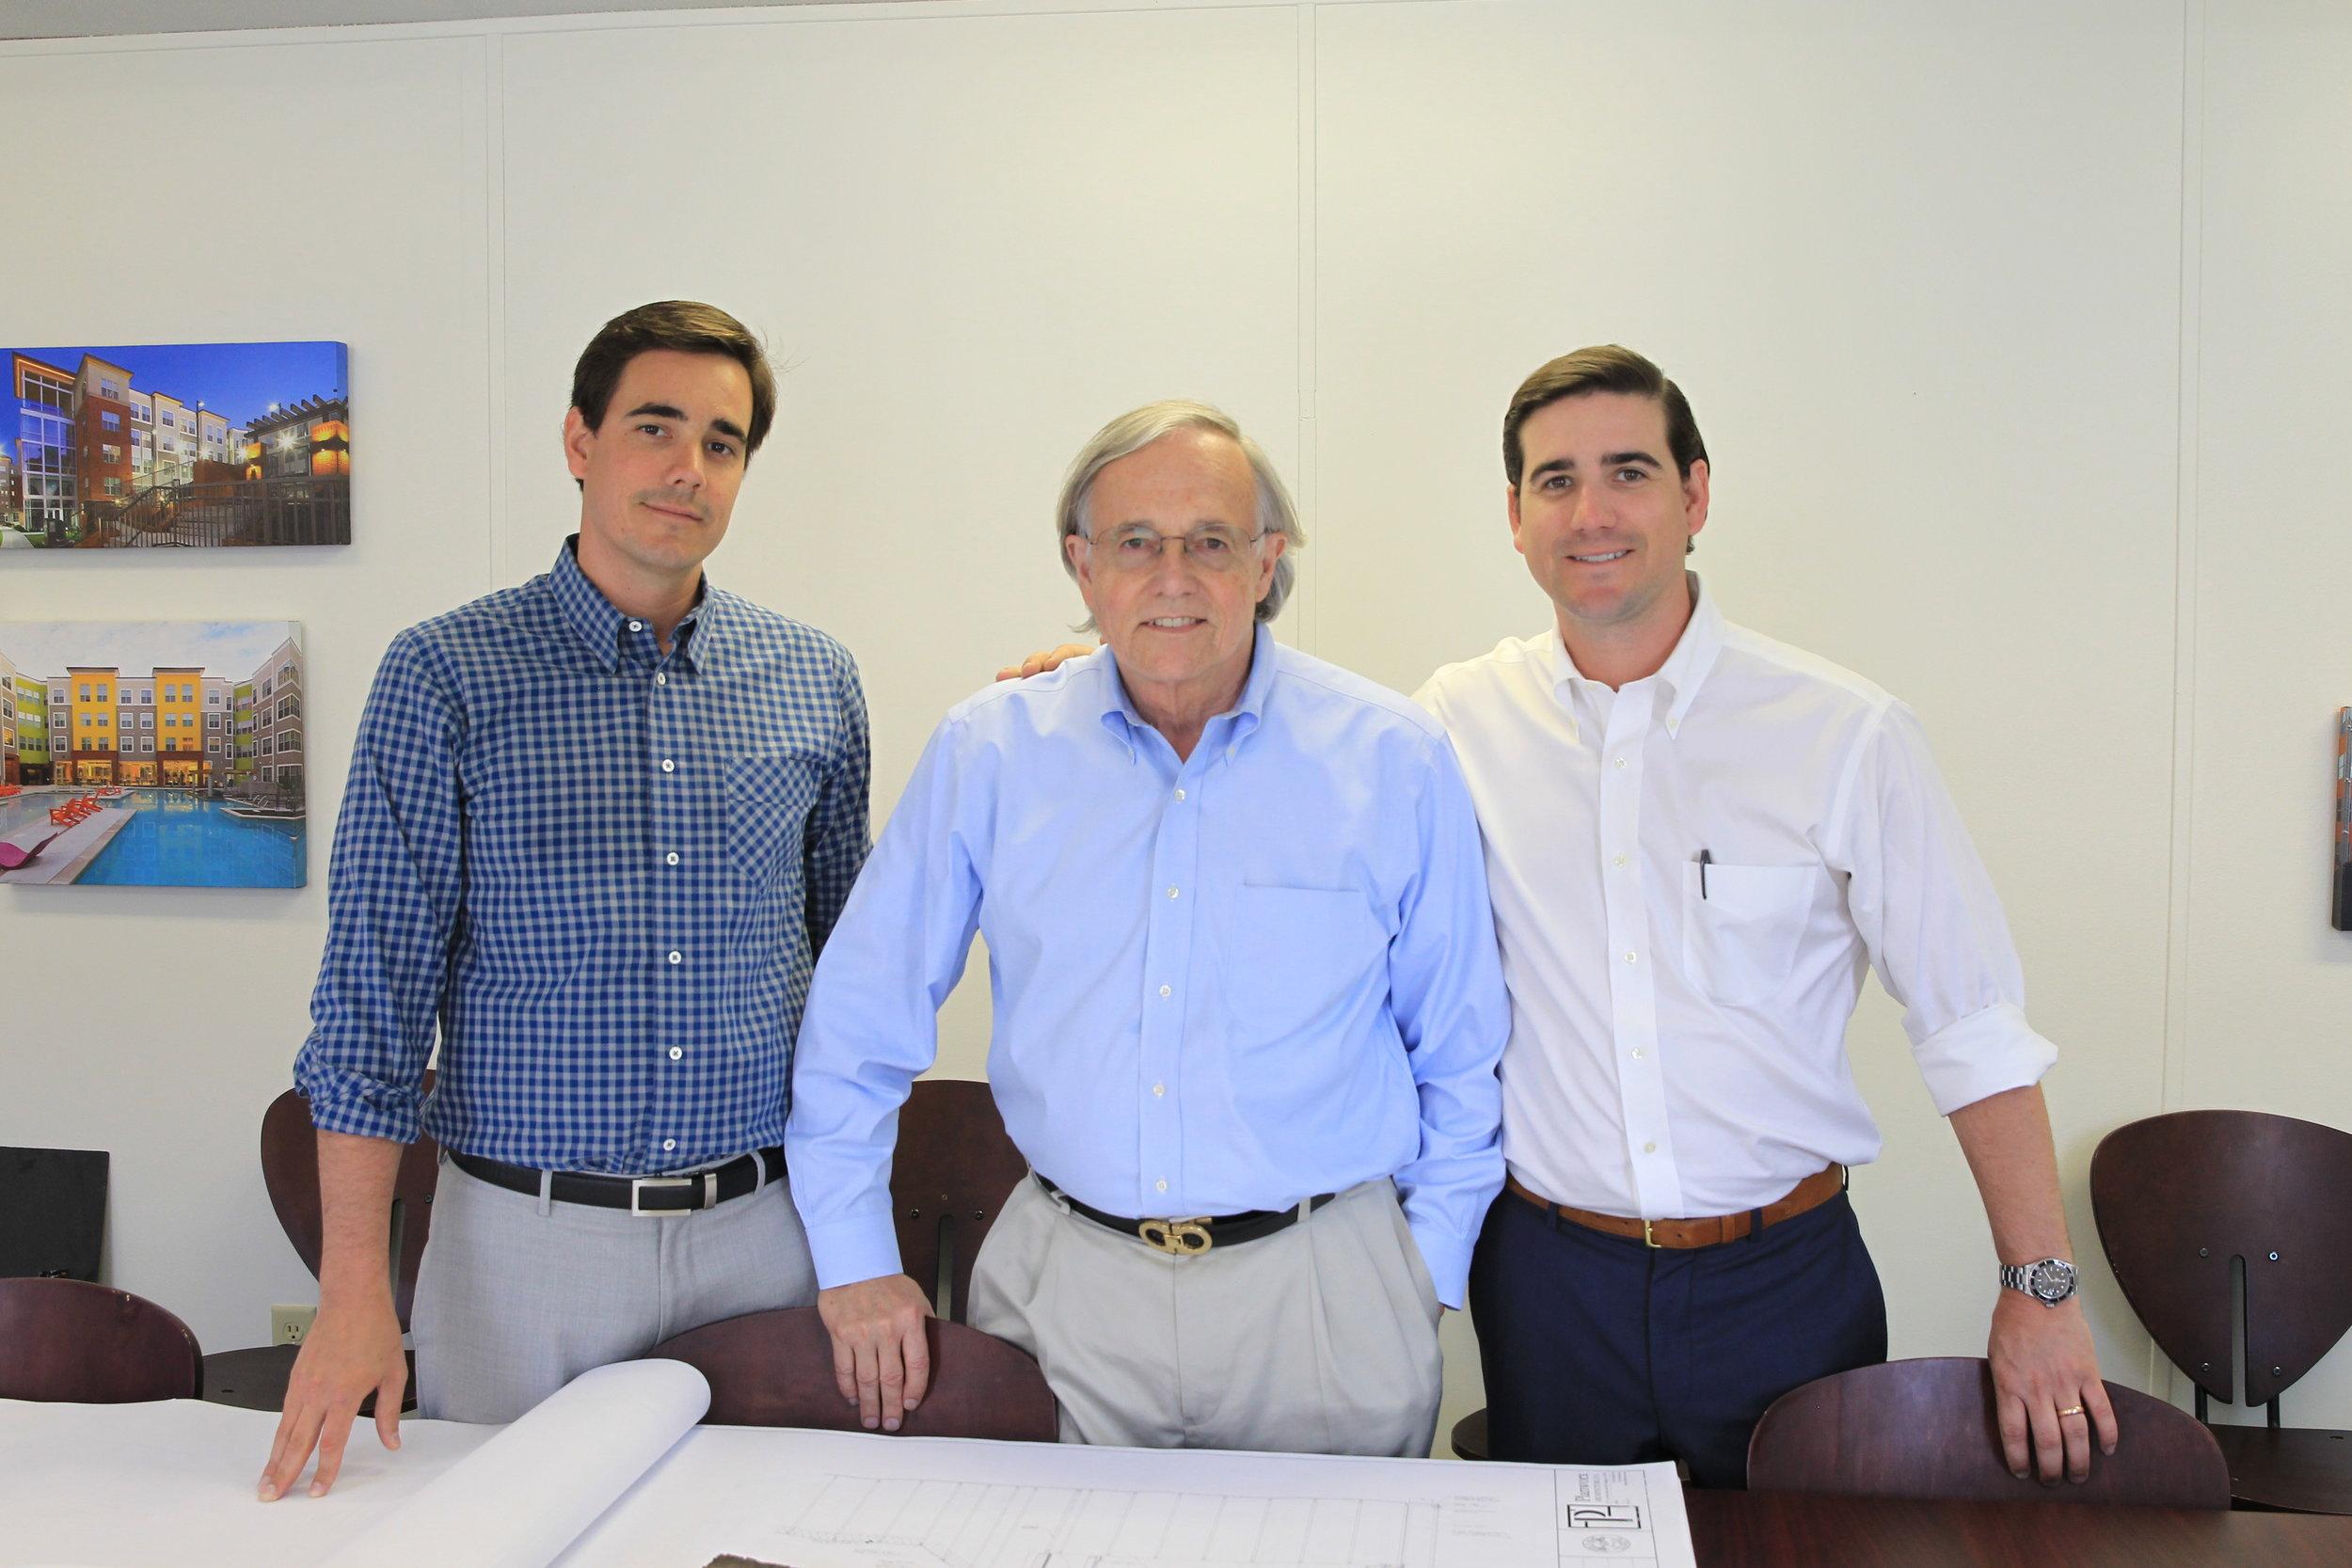 A Third-Generation Family Operation: Thomas F. Taft, Sr. with his sons Thomas F. Taft, Jr. and Jonathan G. Taft